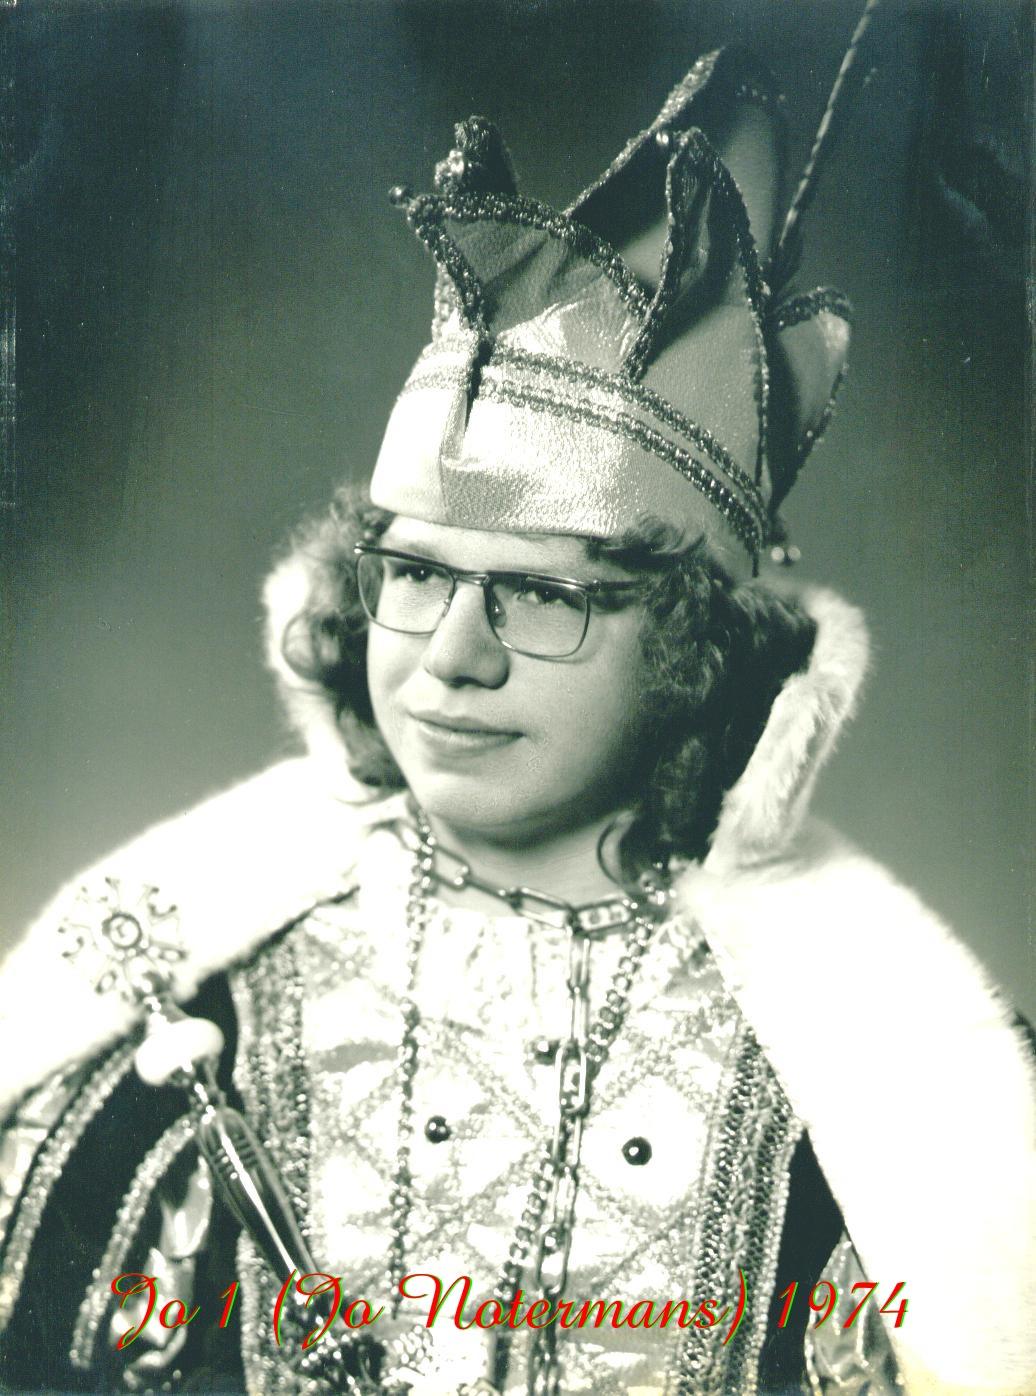 1974 Prins Jo (I) Notermans